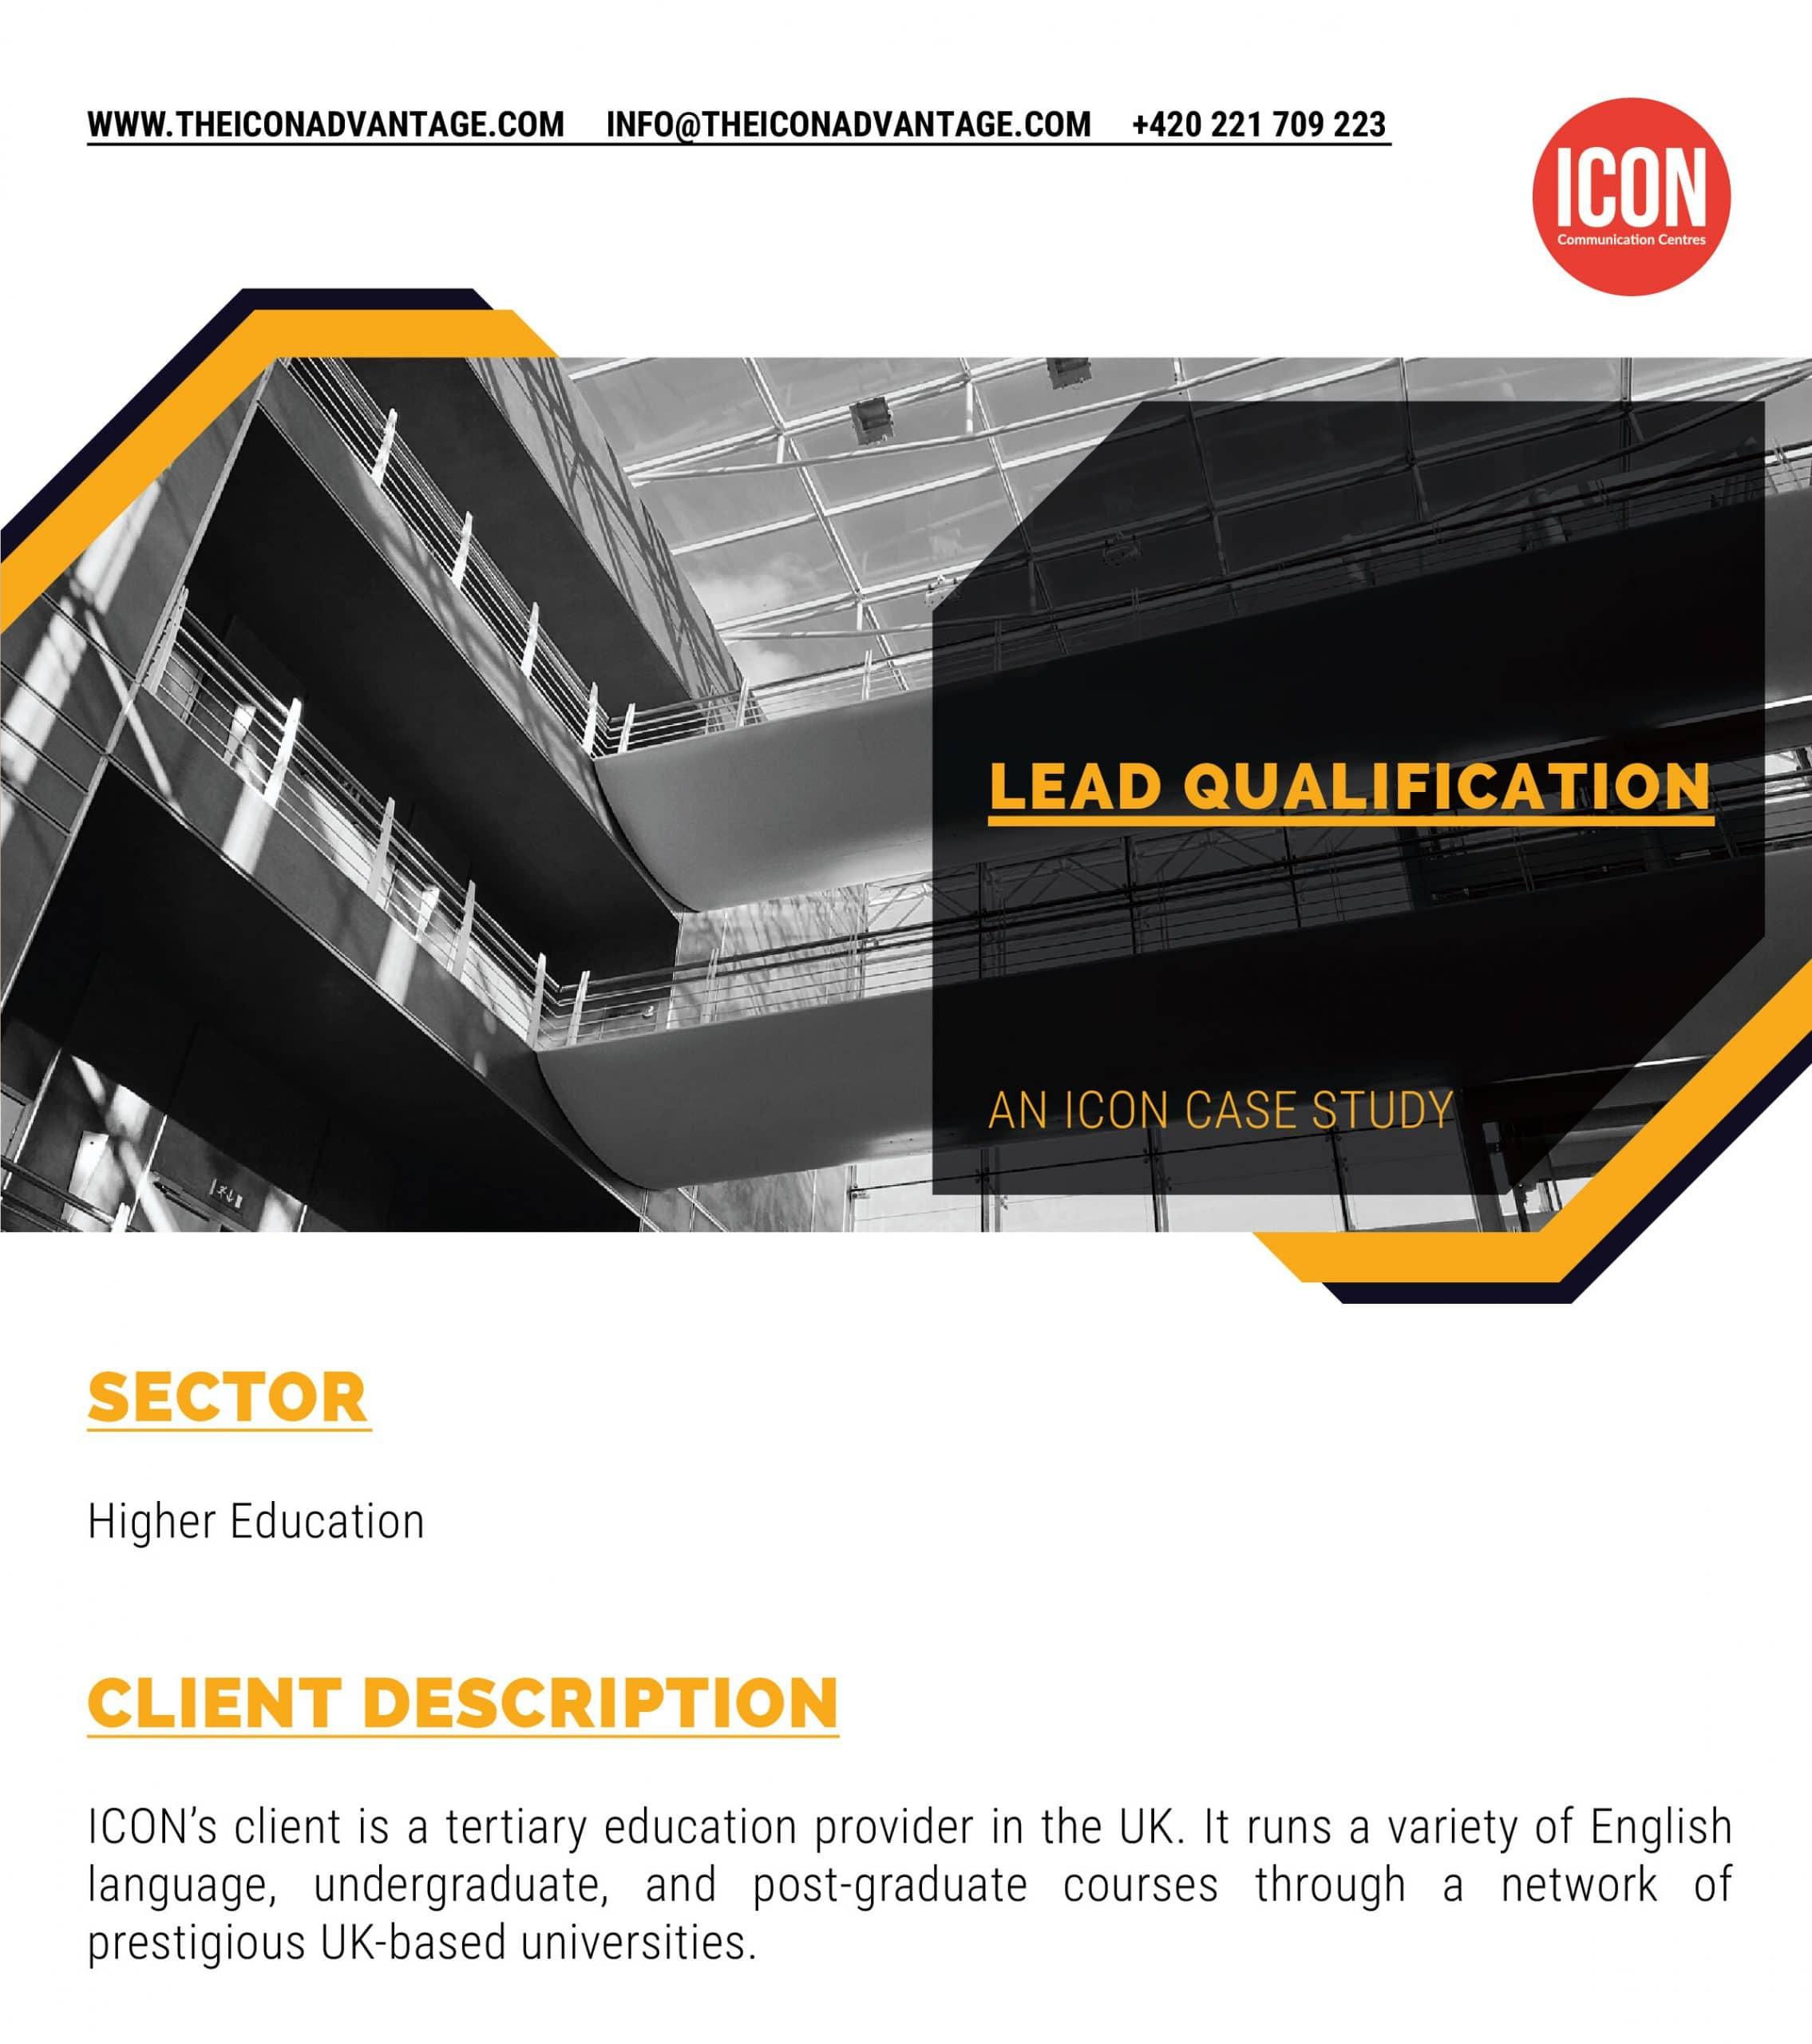 icon_case_study_lead_qualification_s1